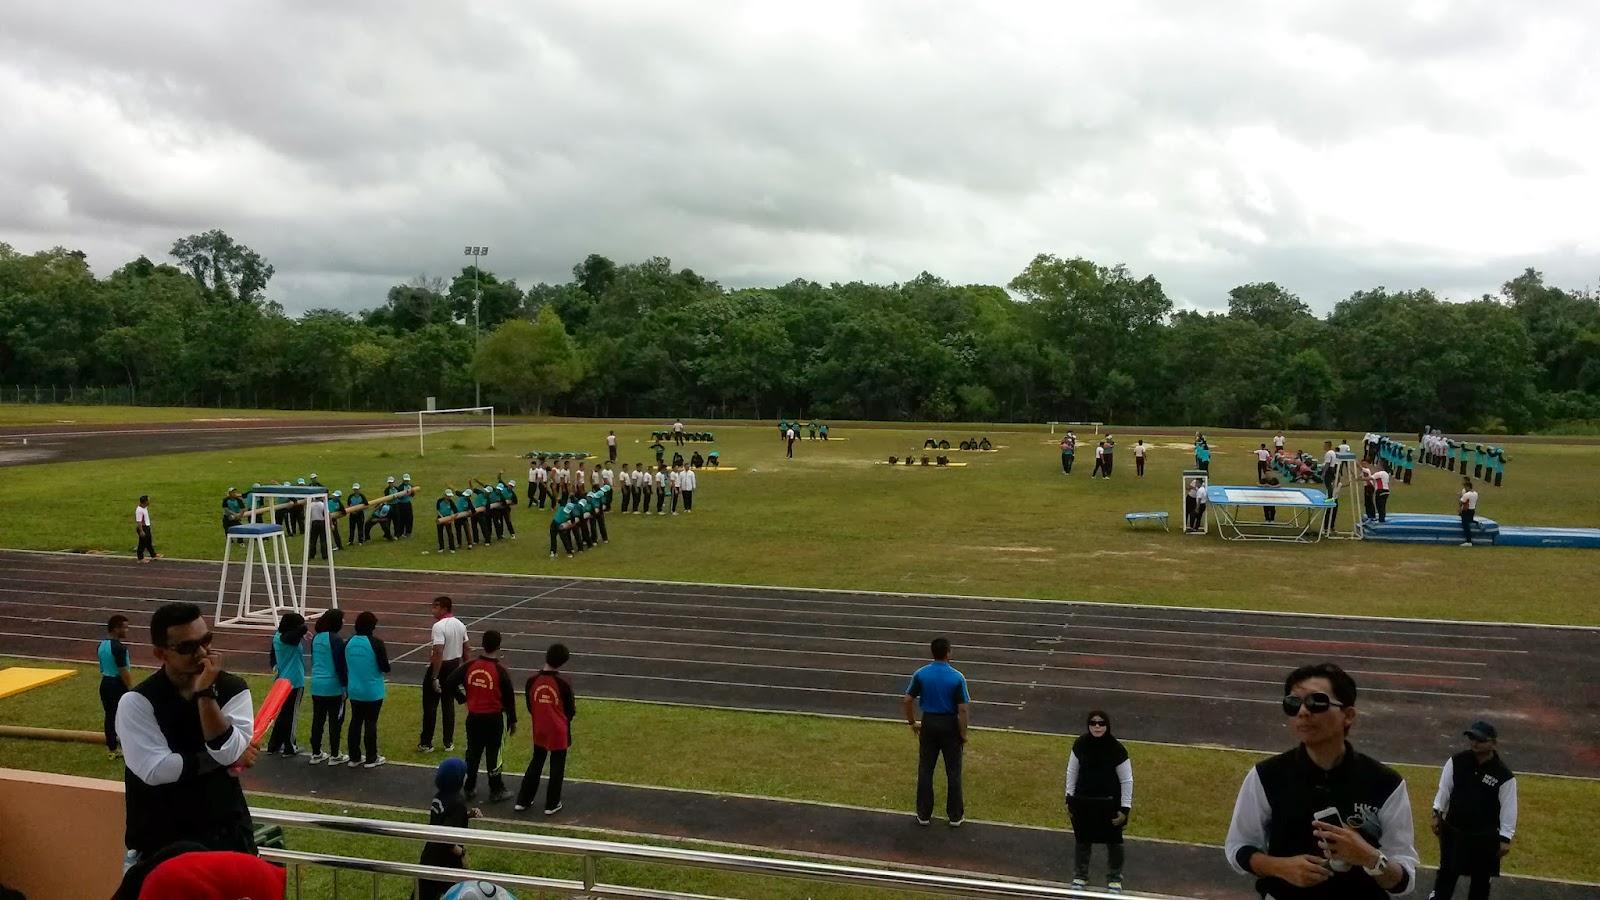 Hari Kebangsaan Brunei 2015 | newhairstylesformen2014.com